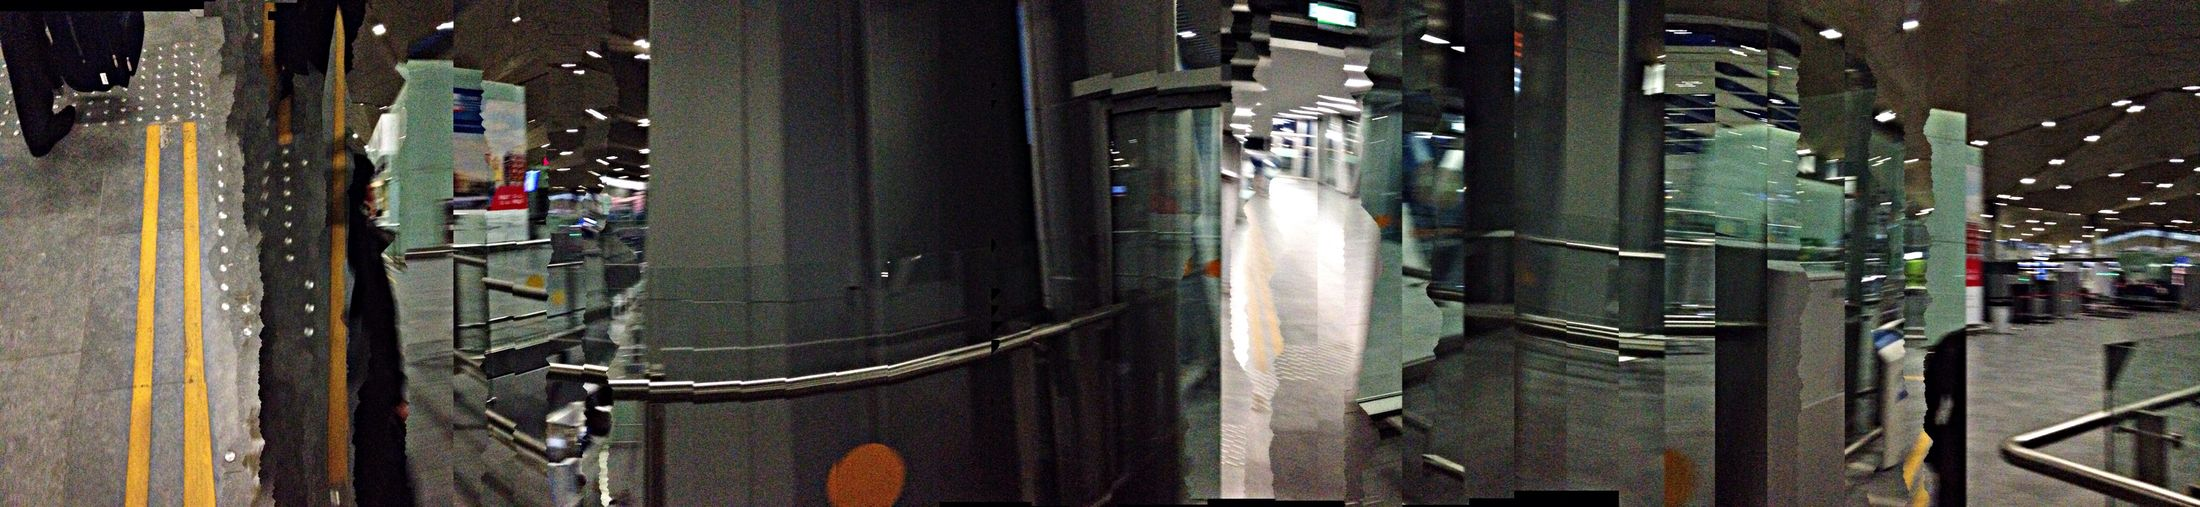 Airport и пришел Я